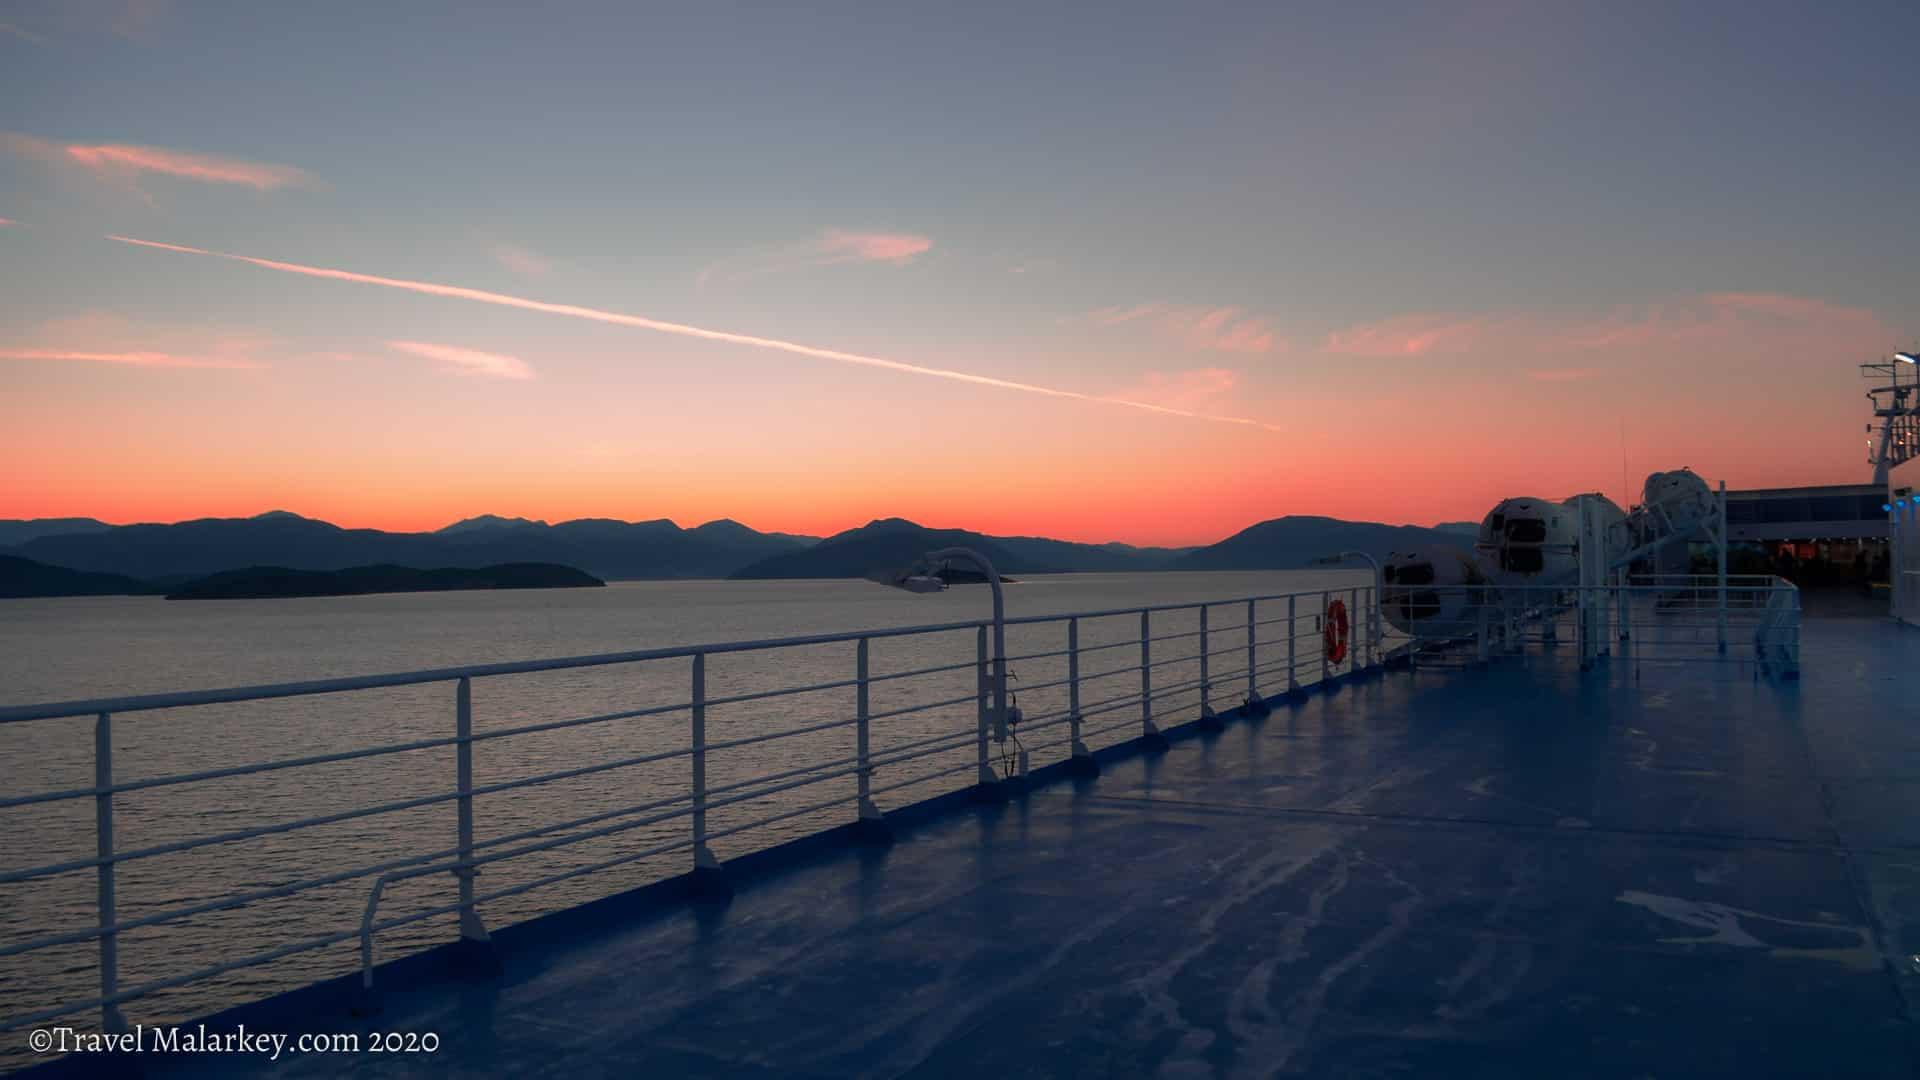 Dawn of a new adventure